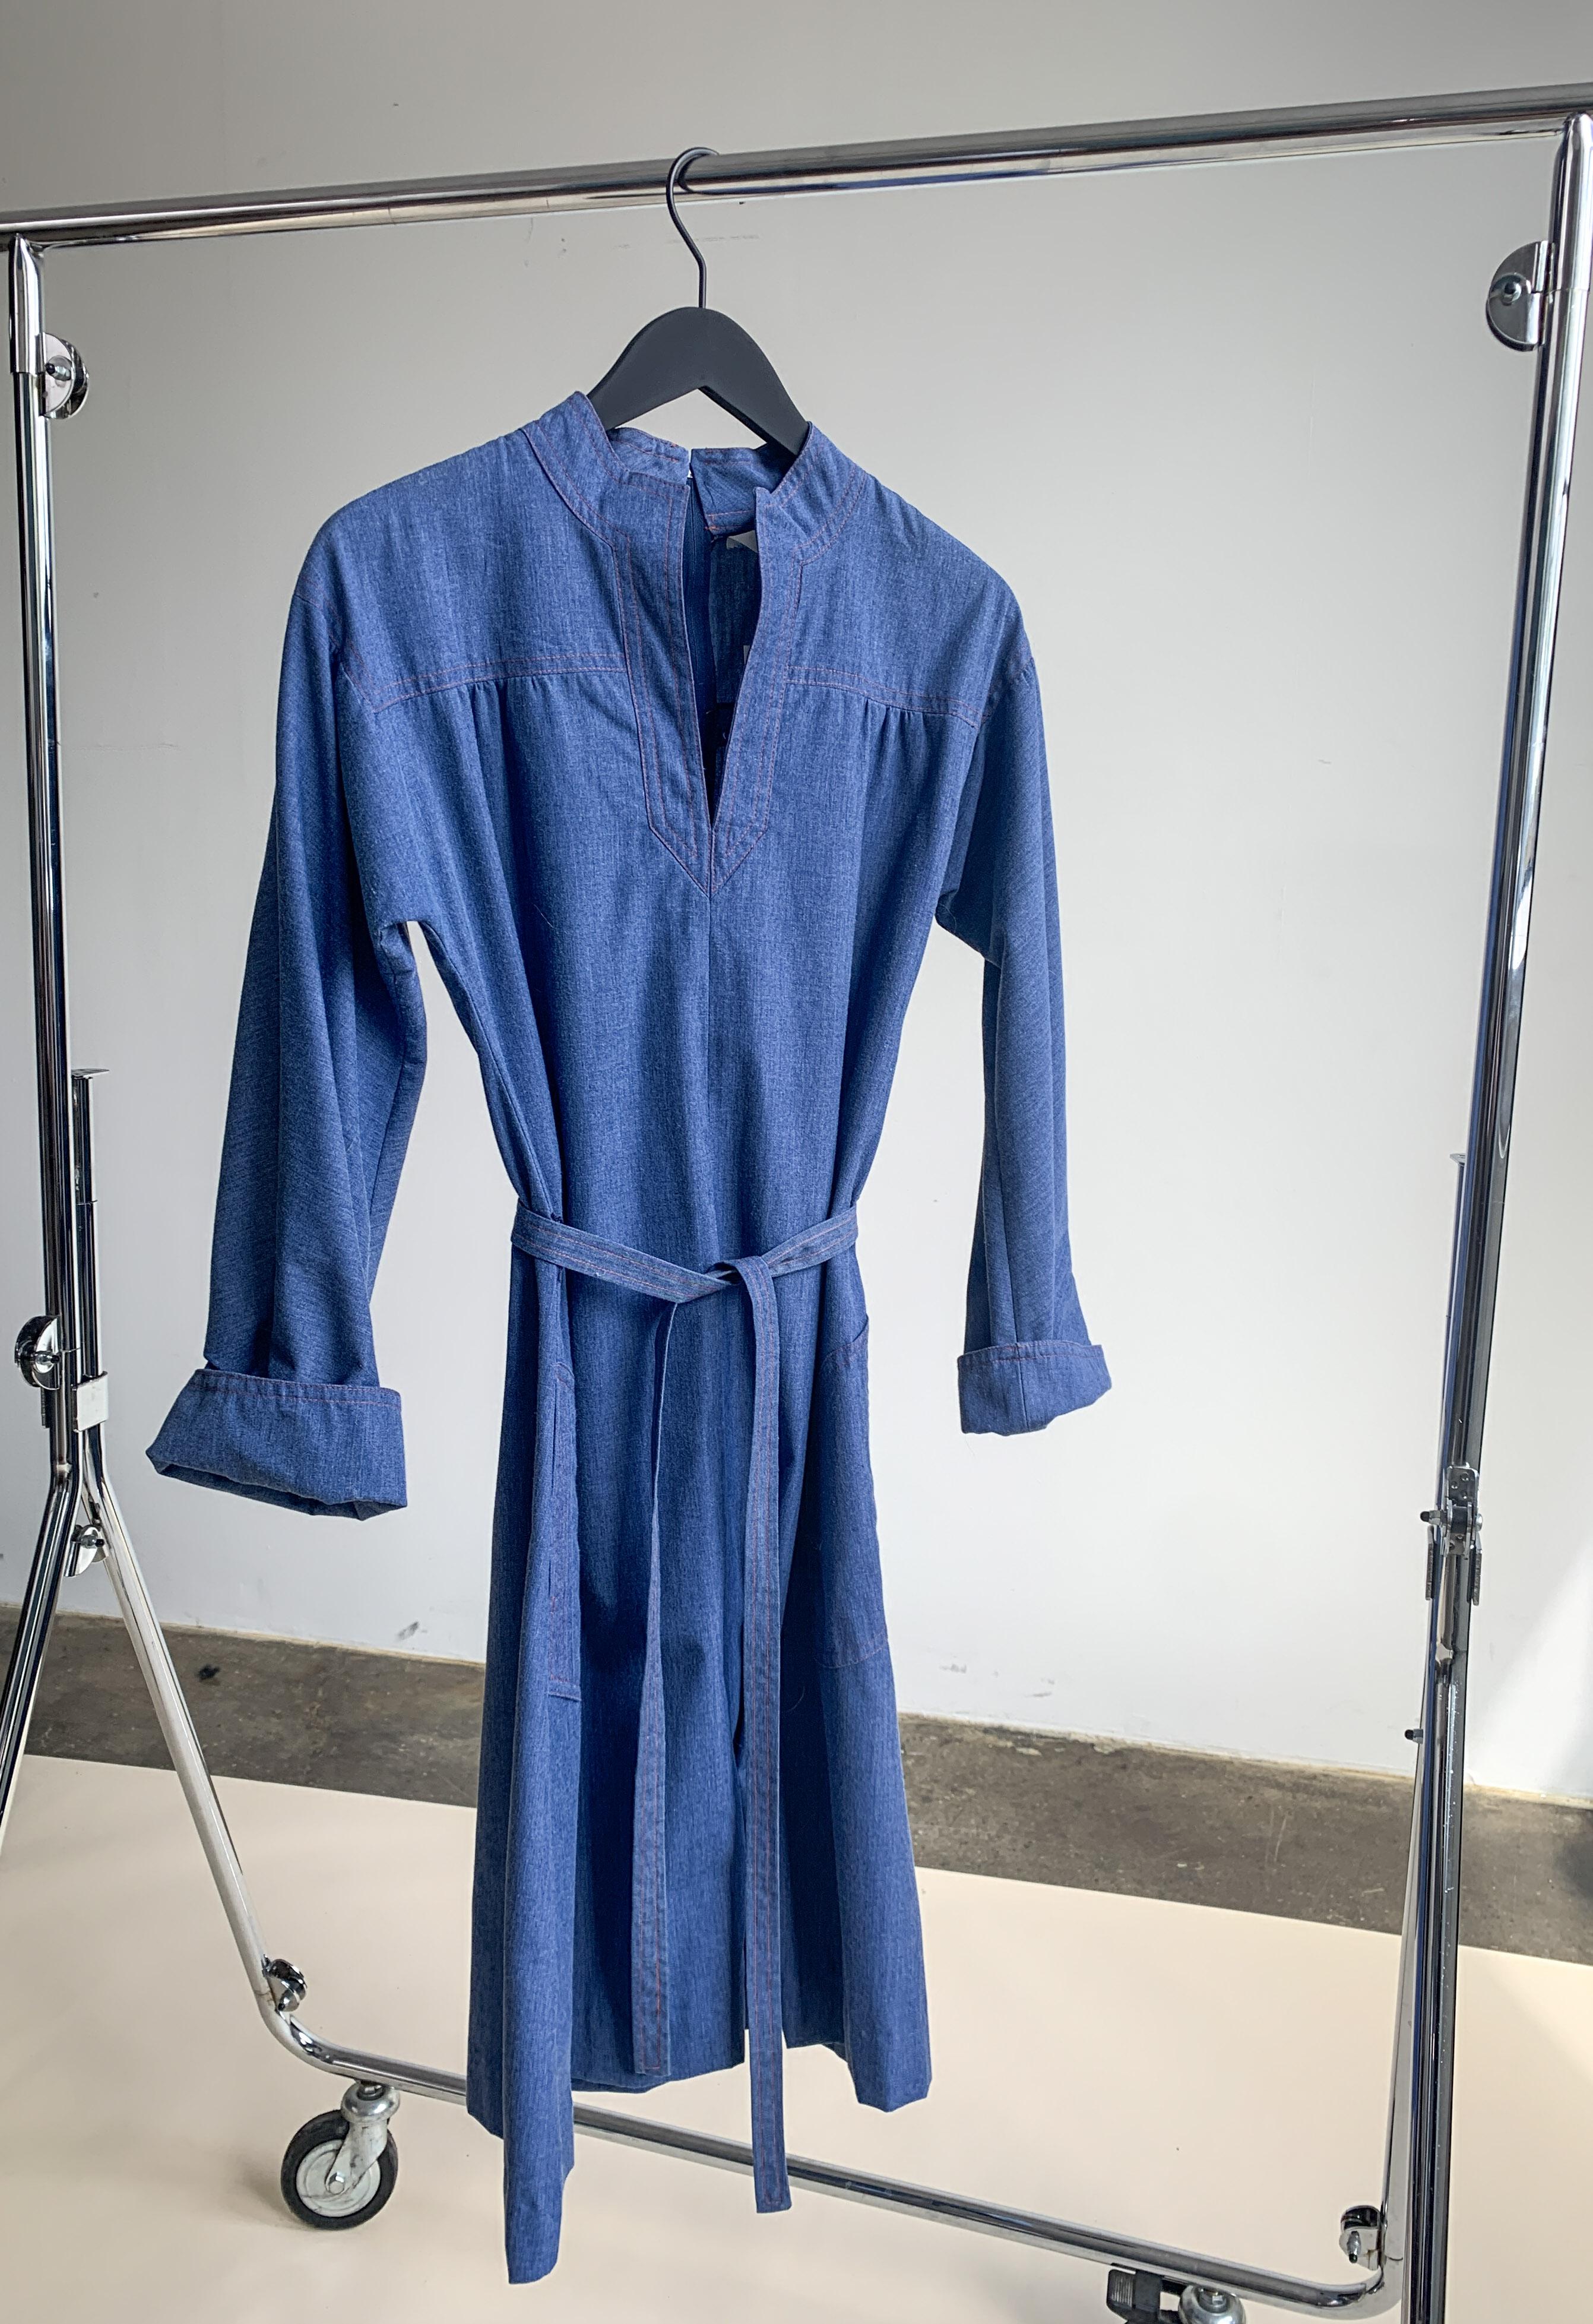 Myre Couture 70s contrast stitch dress